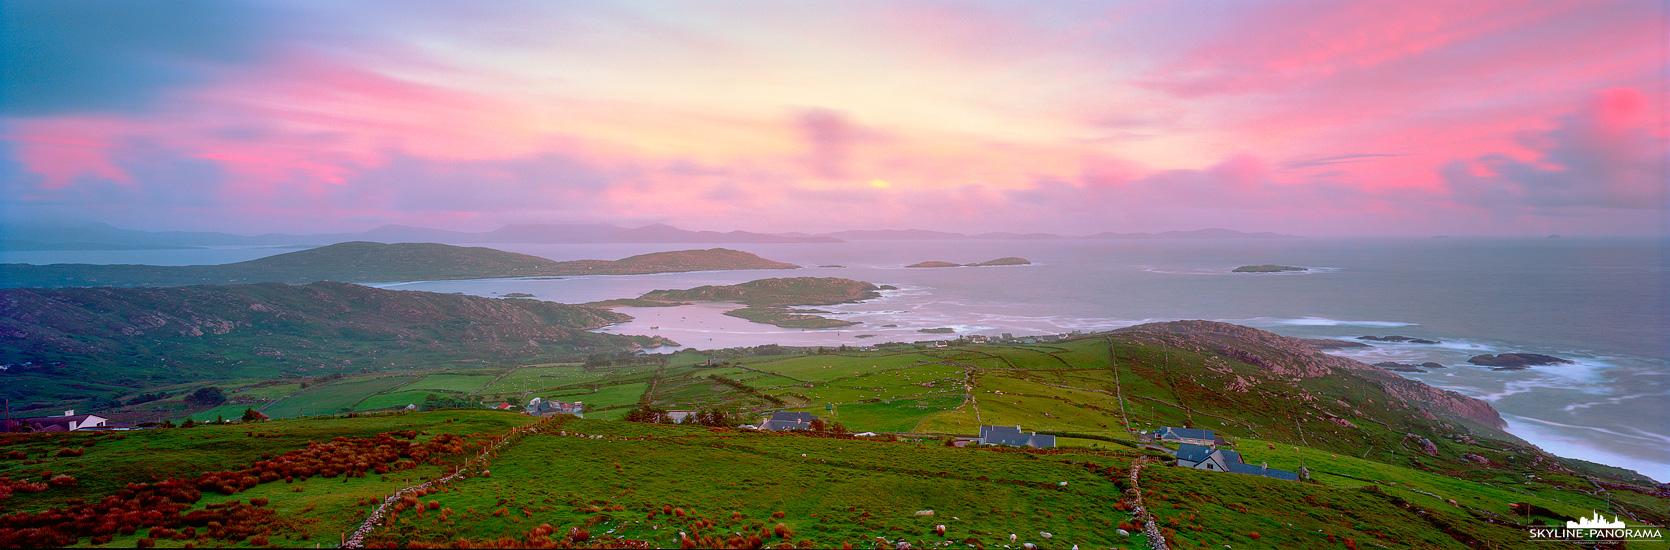 Sehenswürdigkeiten Irland - Ring of Kerry (p_01172)